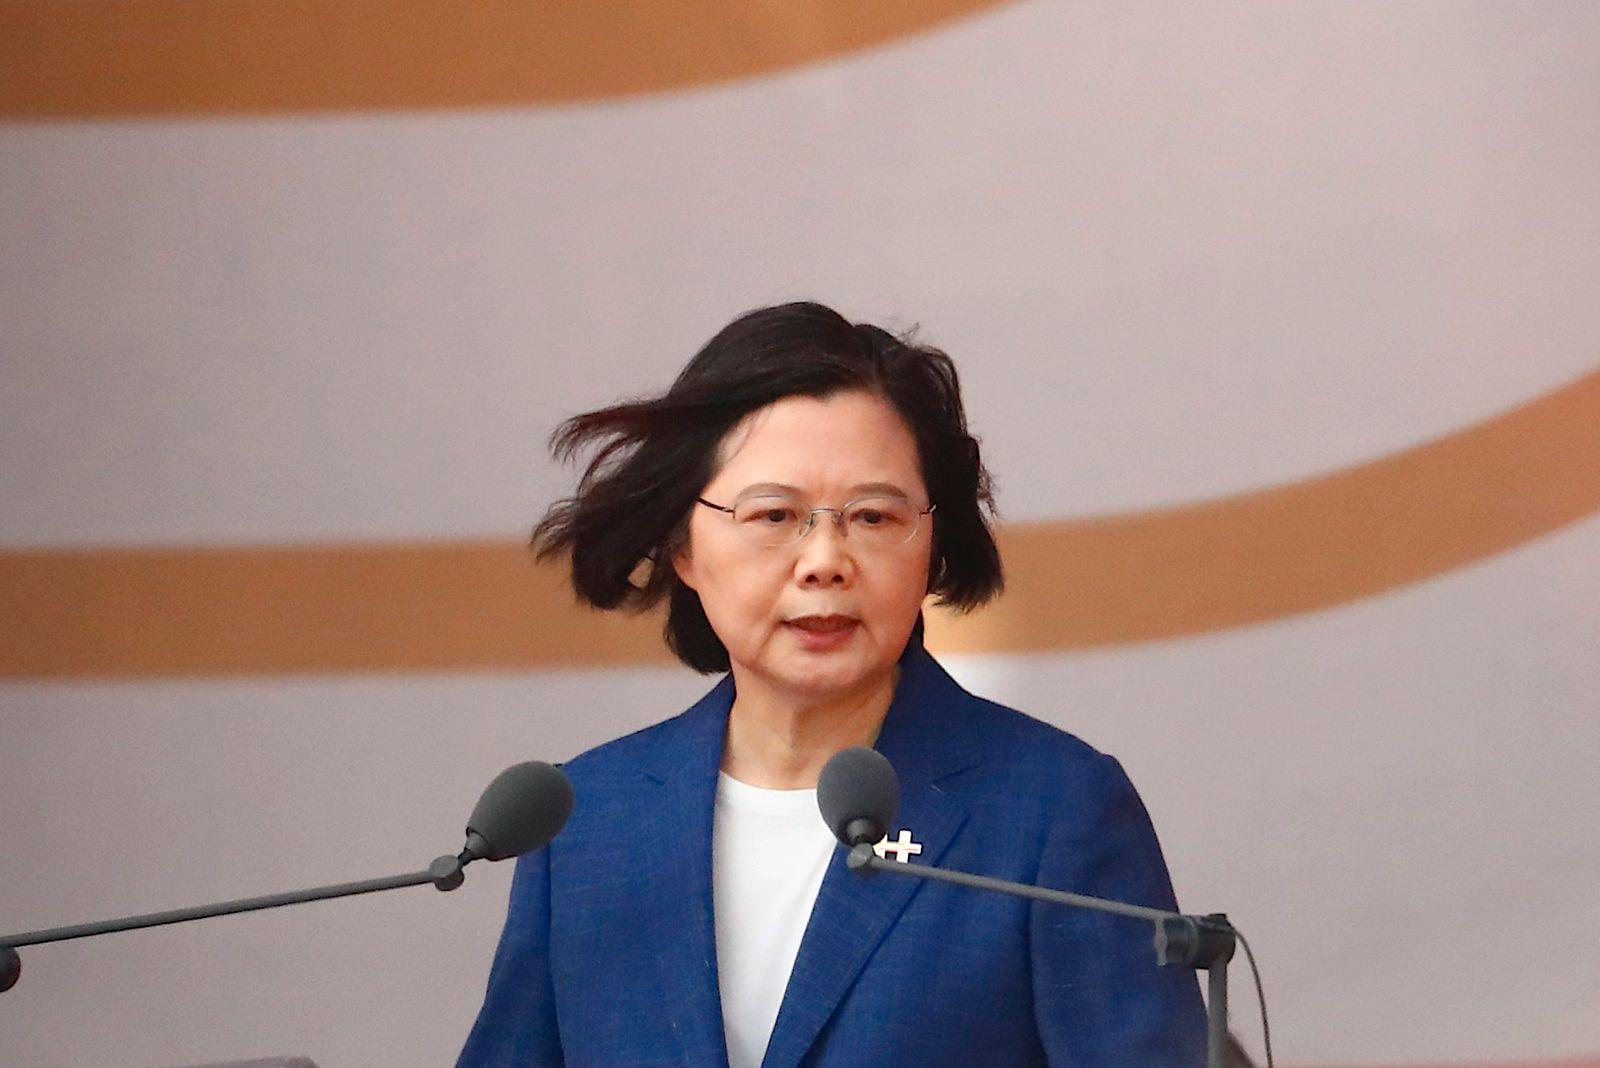 Taiwan: President Tsai Ing-wen speaks during Double-Tenth National Day Celebration